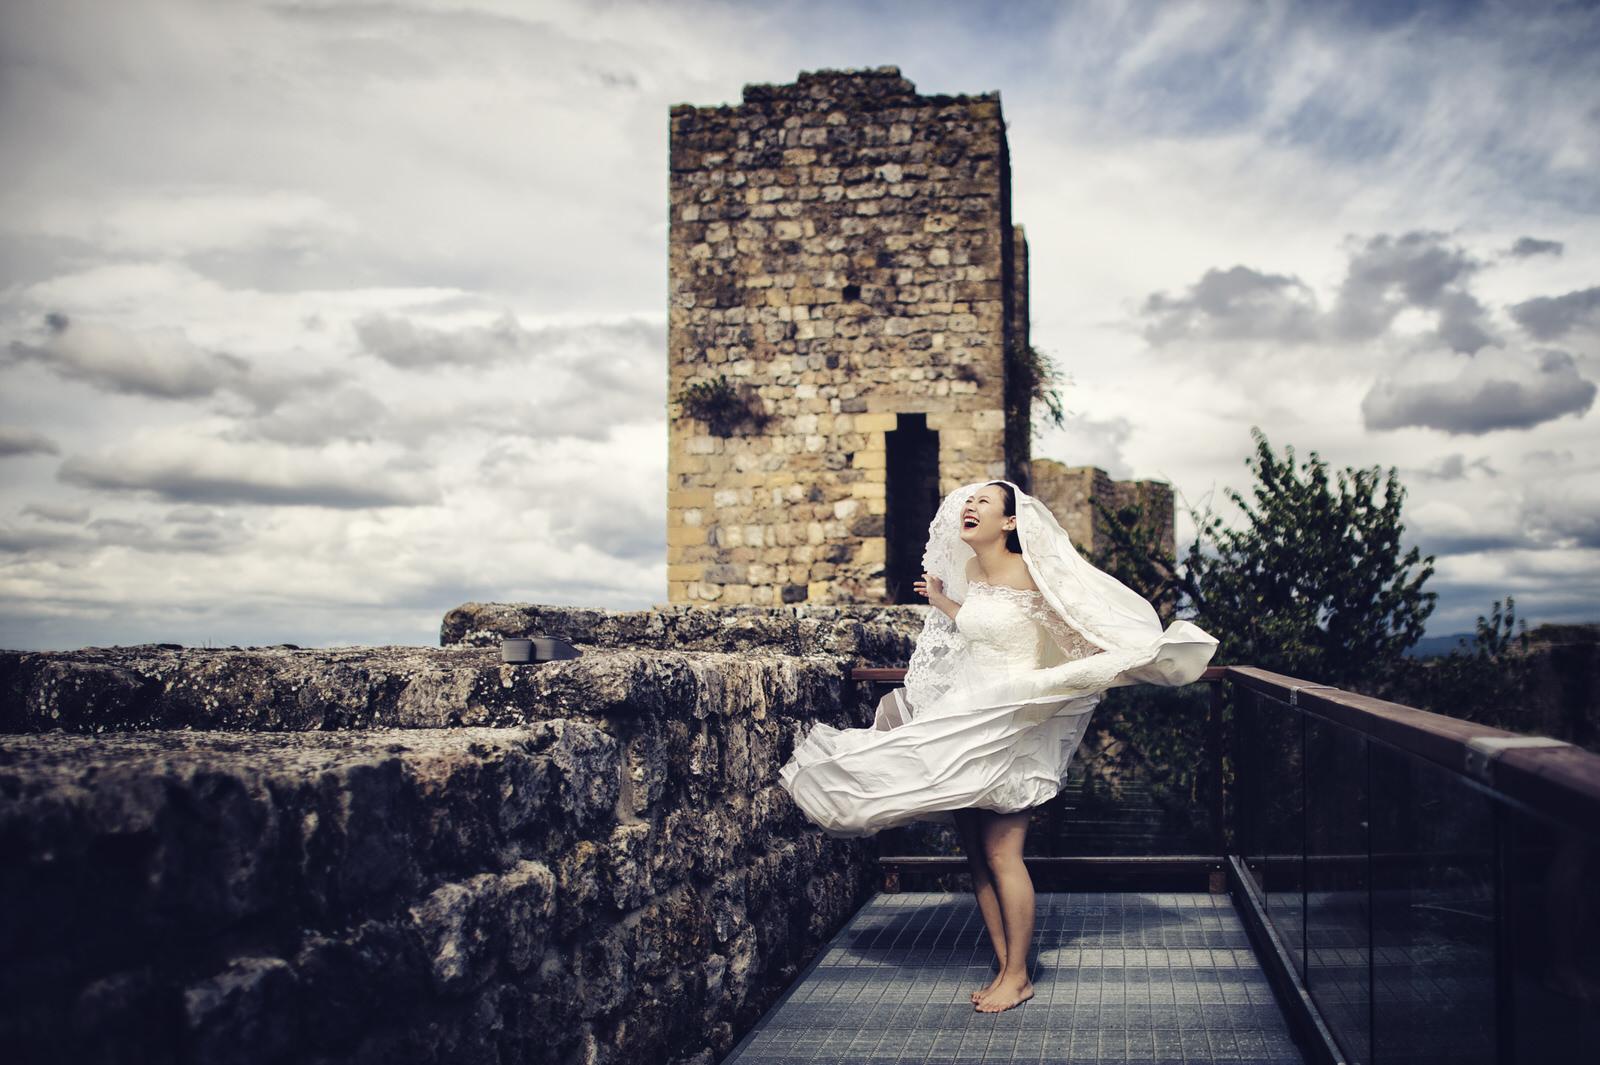 wedding photographer in italy-venice-tuscany-florence-amalfi coast-como lake-villa del balbianello-siena-amalfi-ravello-belmond-villa cimbrone7